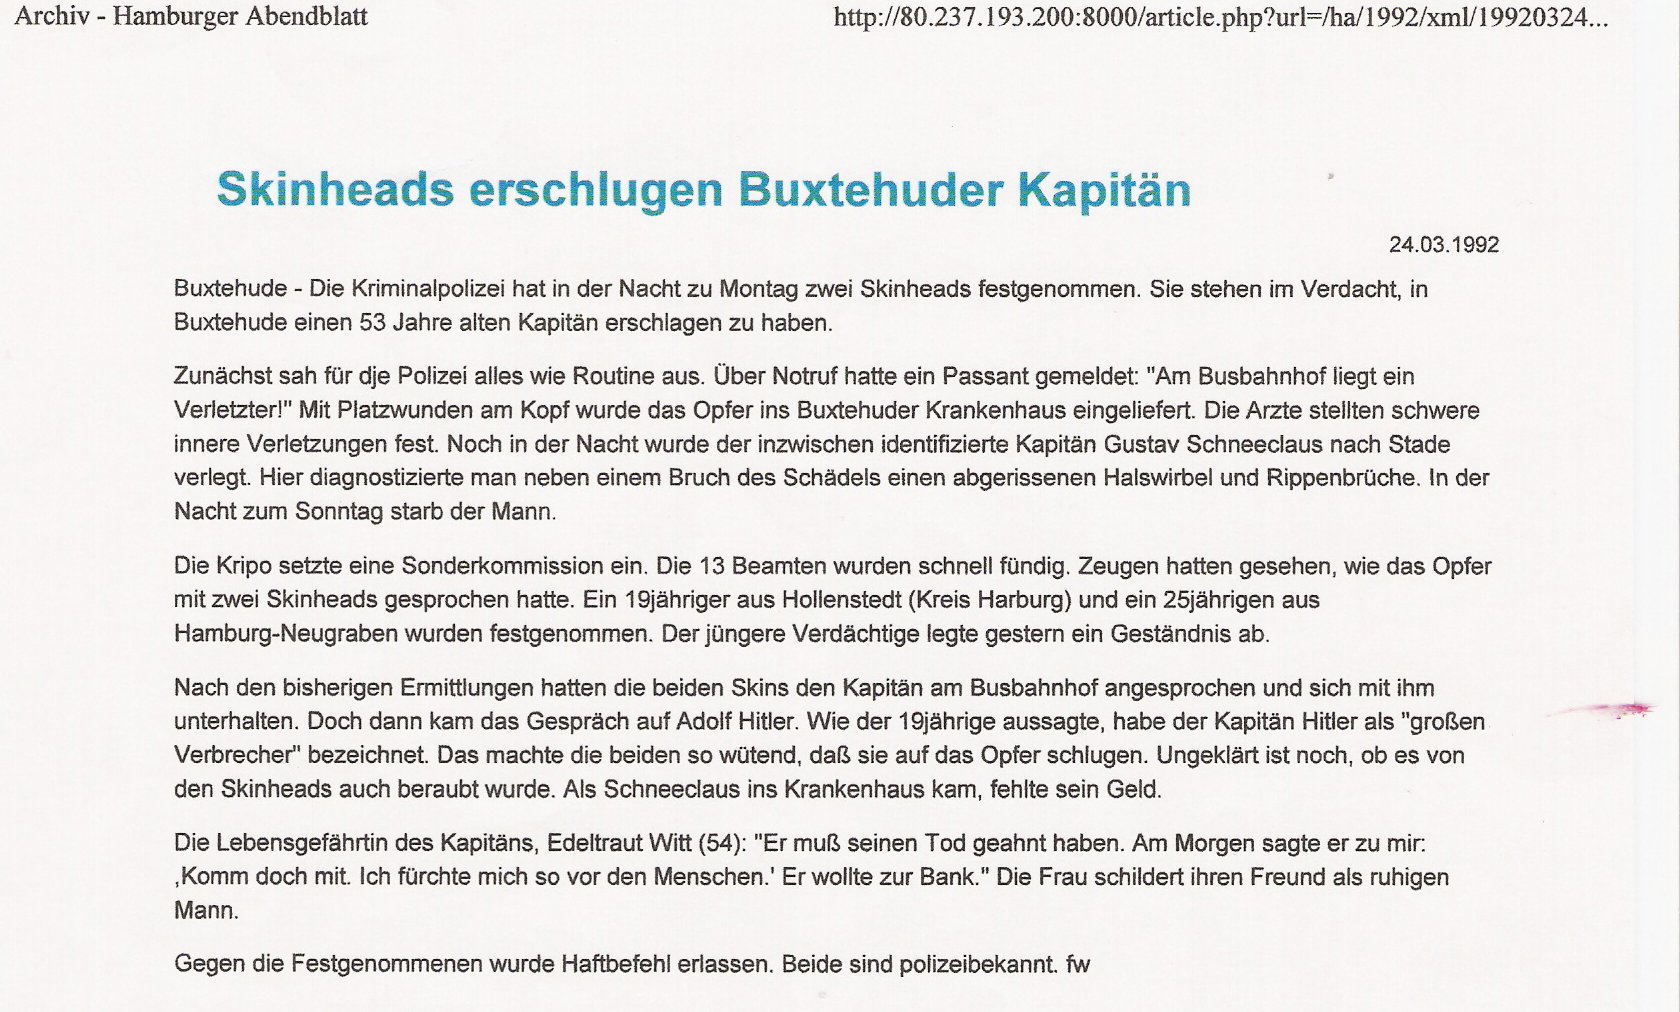 Hamburger Abendblatt1 24.3.1992